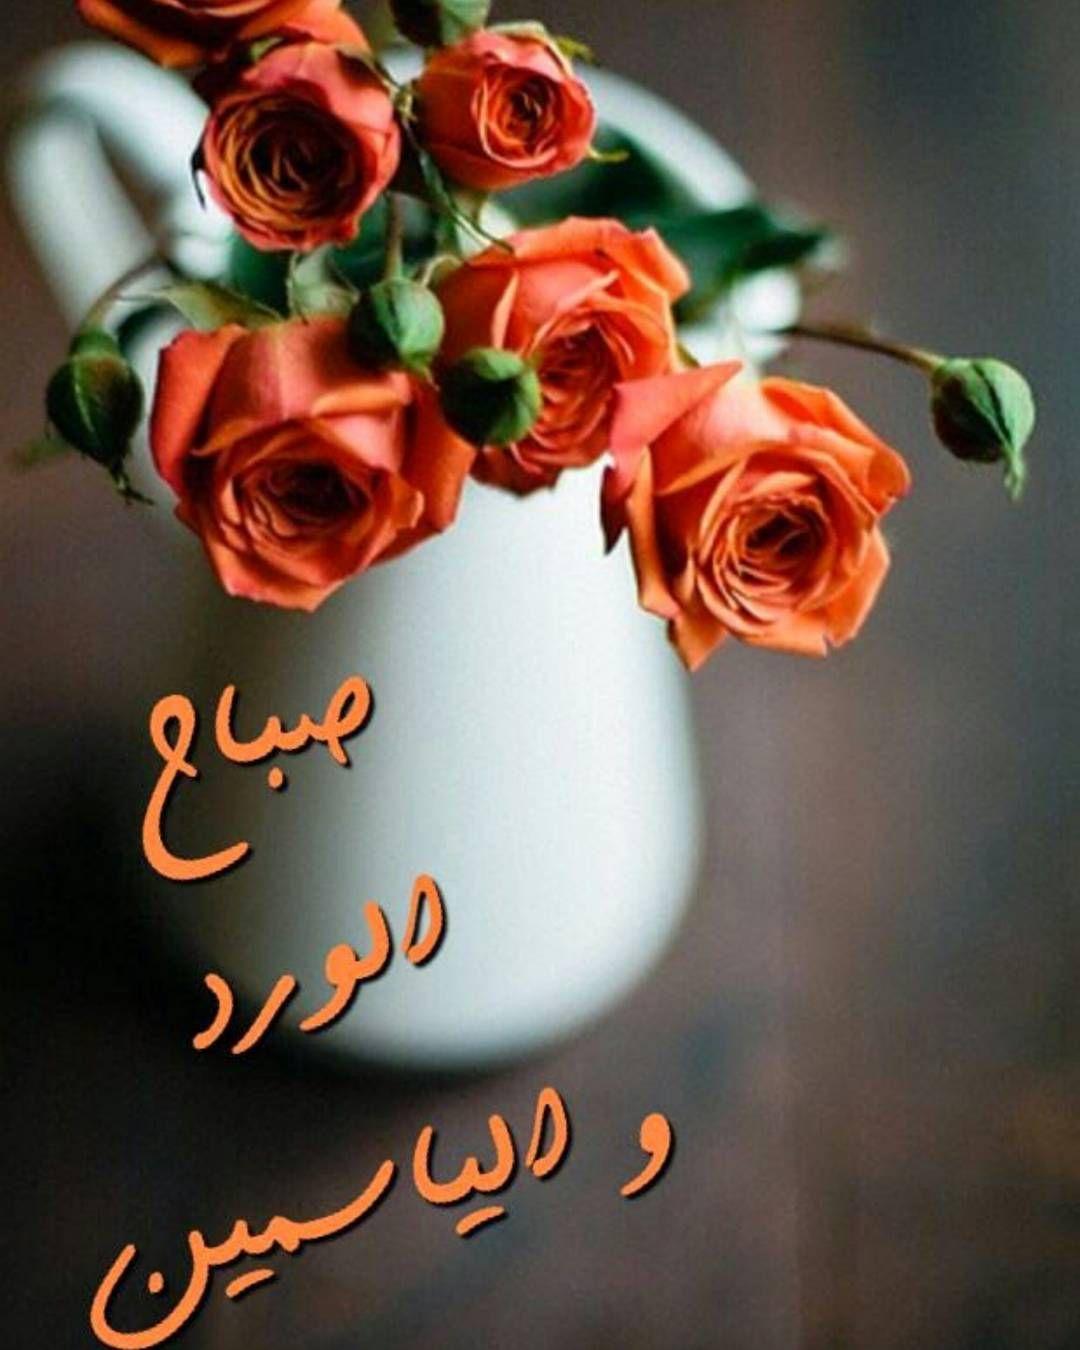 Emraa On Instagram صباحكم ورد وفل وياسمين نتمني لكم جميعا يوم مشرق ومليئ باﻷخبار السارة Good Morning Flowers Good Morning Greetings Good Morning Arabic